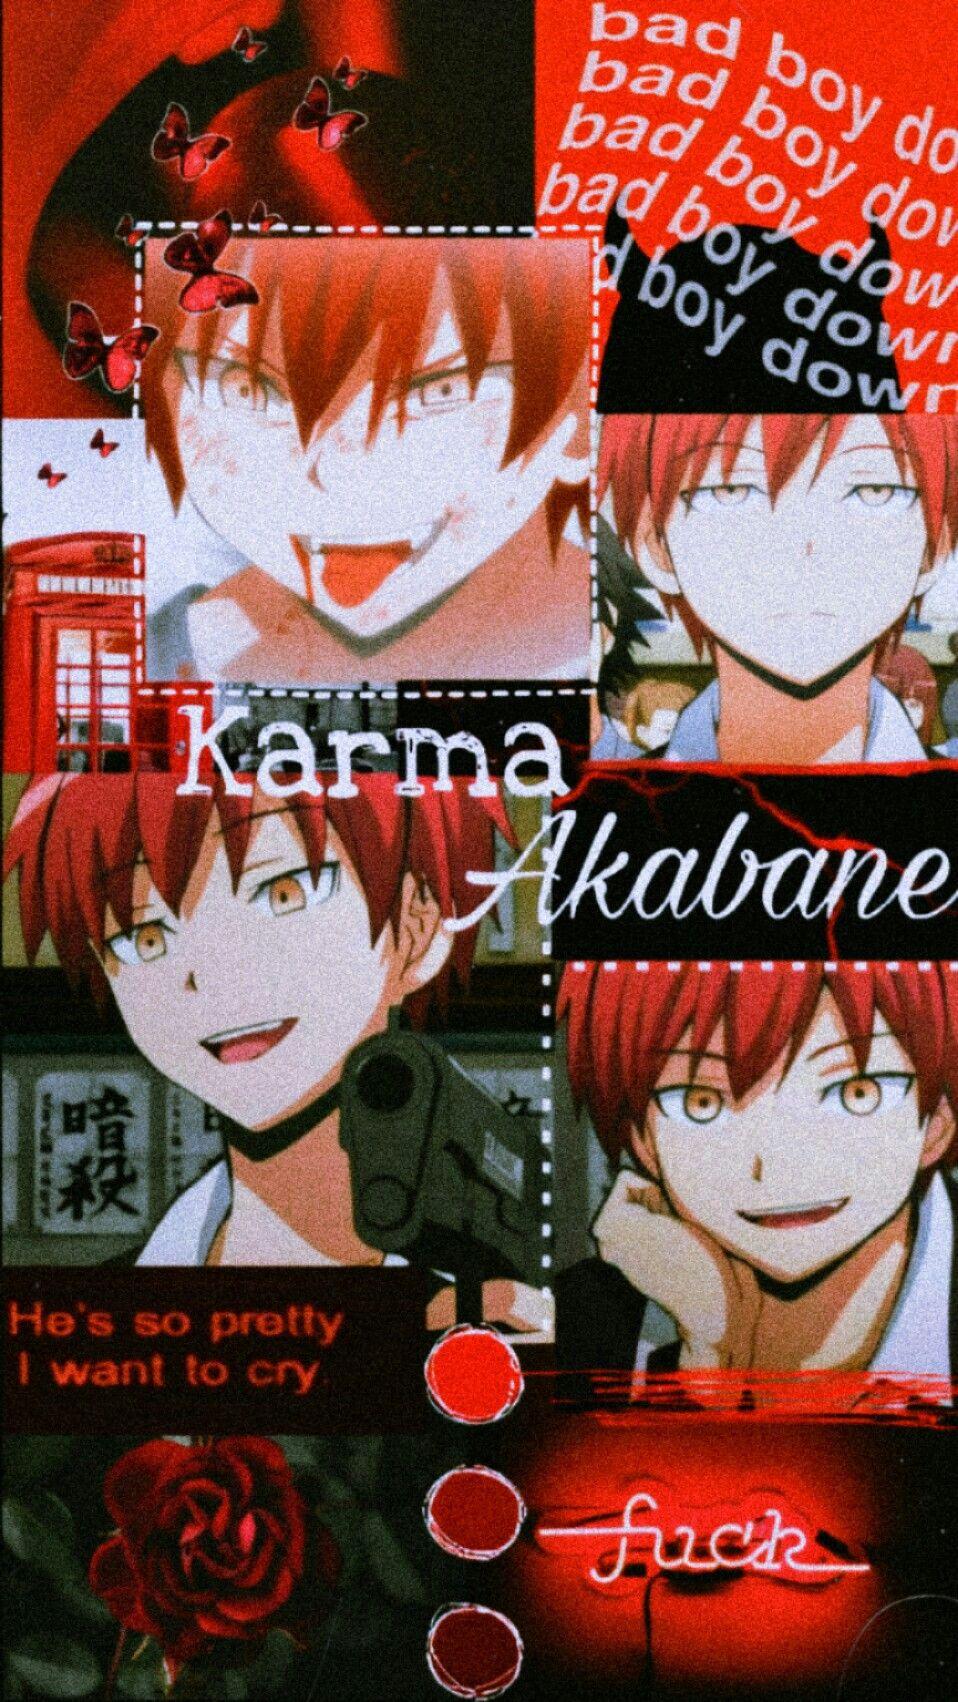 Karma Akabane Wallpaper Anime Classroom Anime Wallpaper Anime Wallpaper Iphone